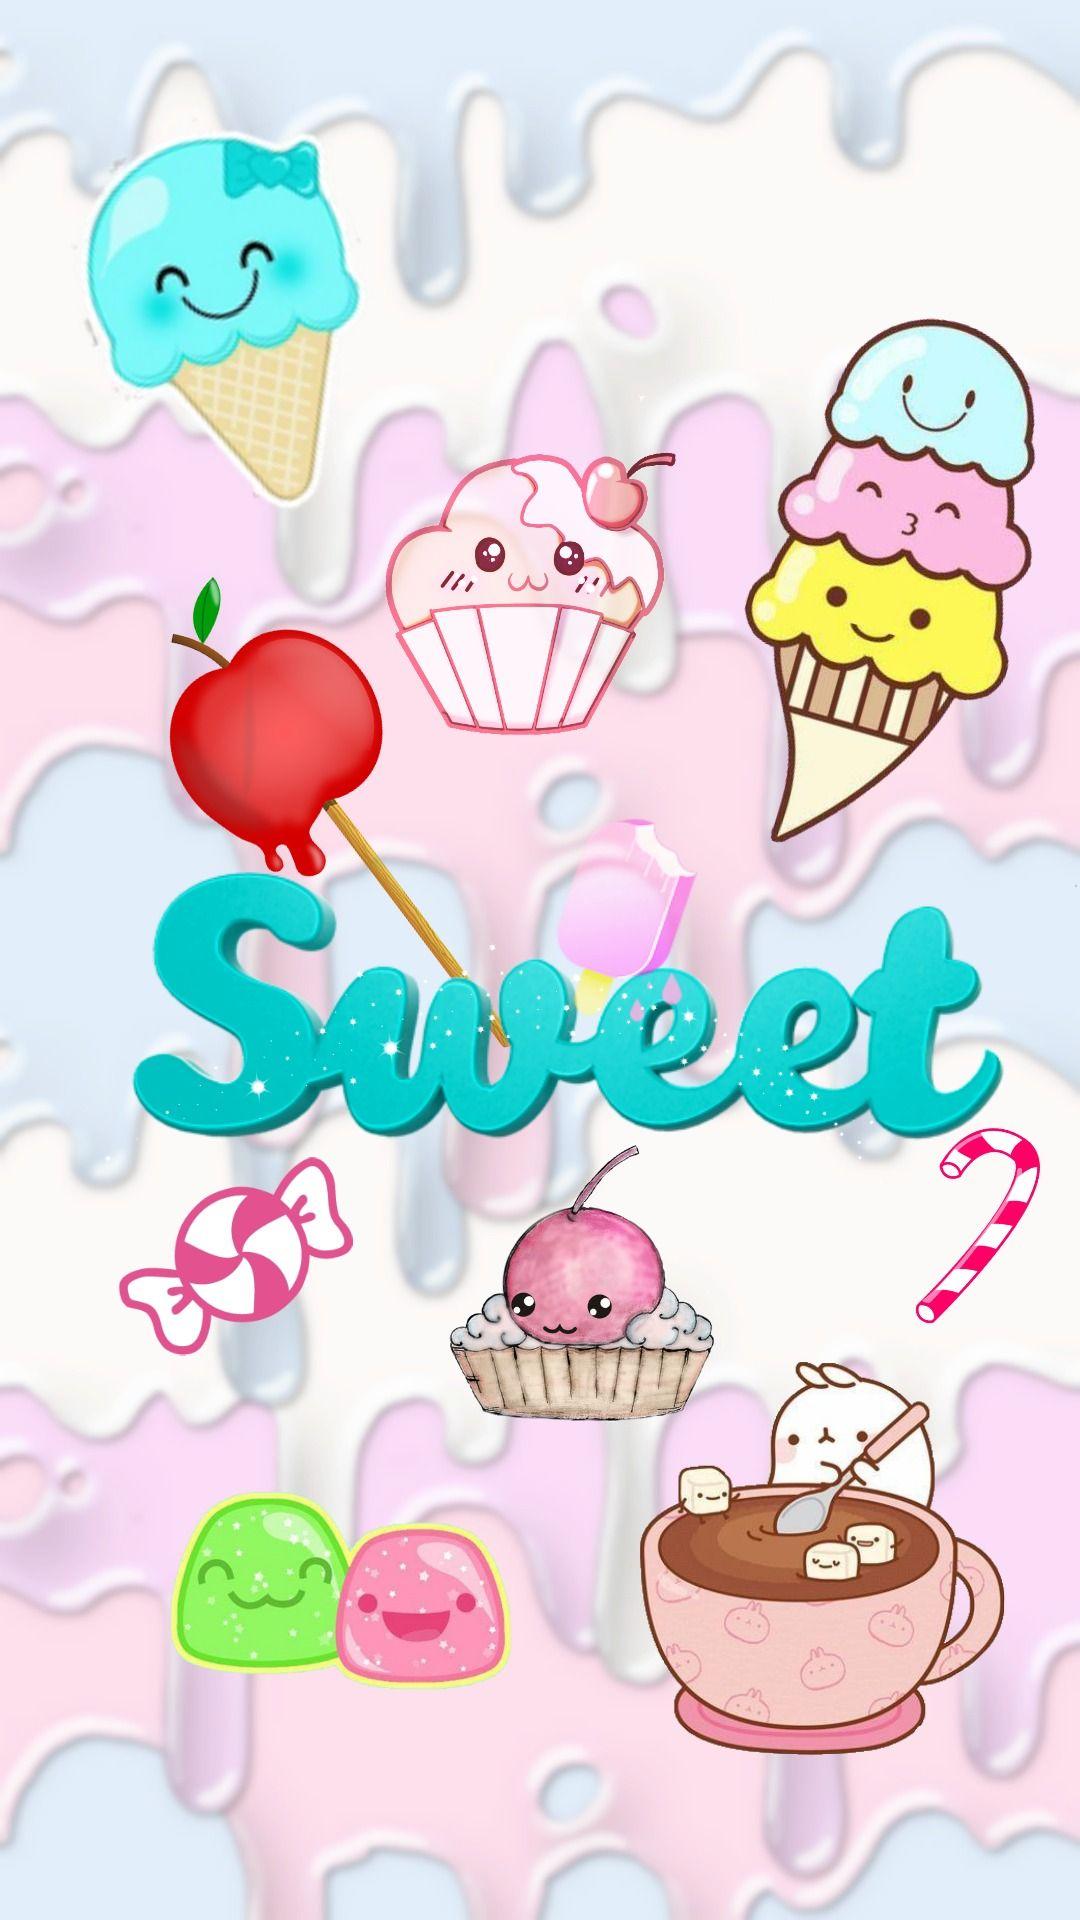 Sweet Cute Wallpaper For Phone Kawaii Wallpaper Iphone Cute 1080x1920 Download Hd Wallpaper Wallpapertip